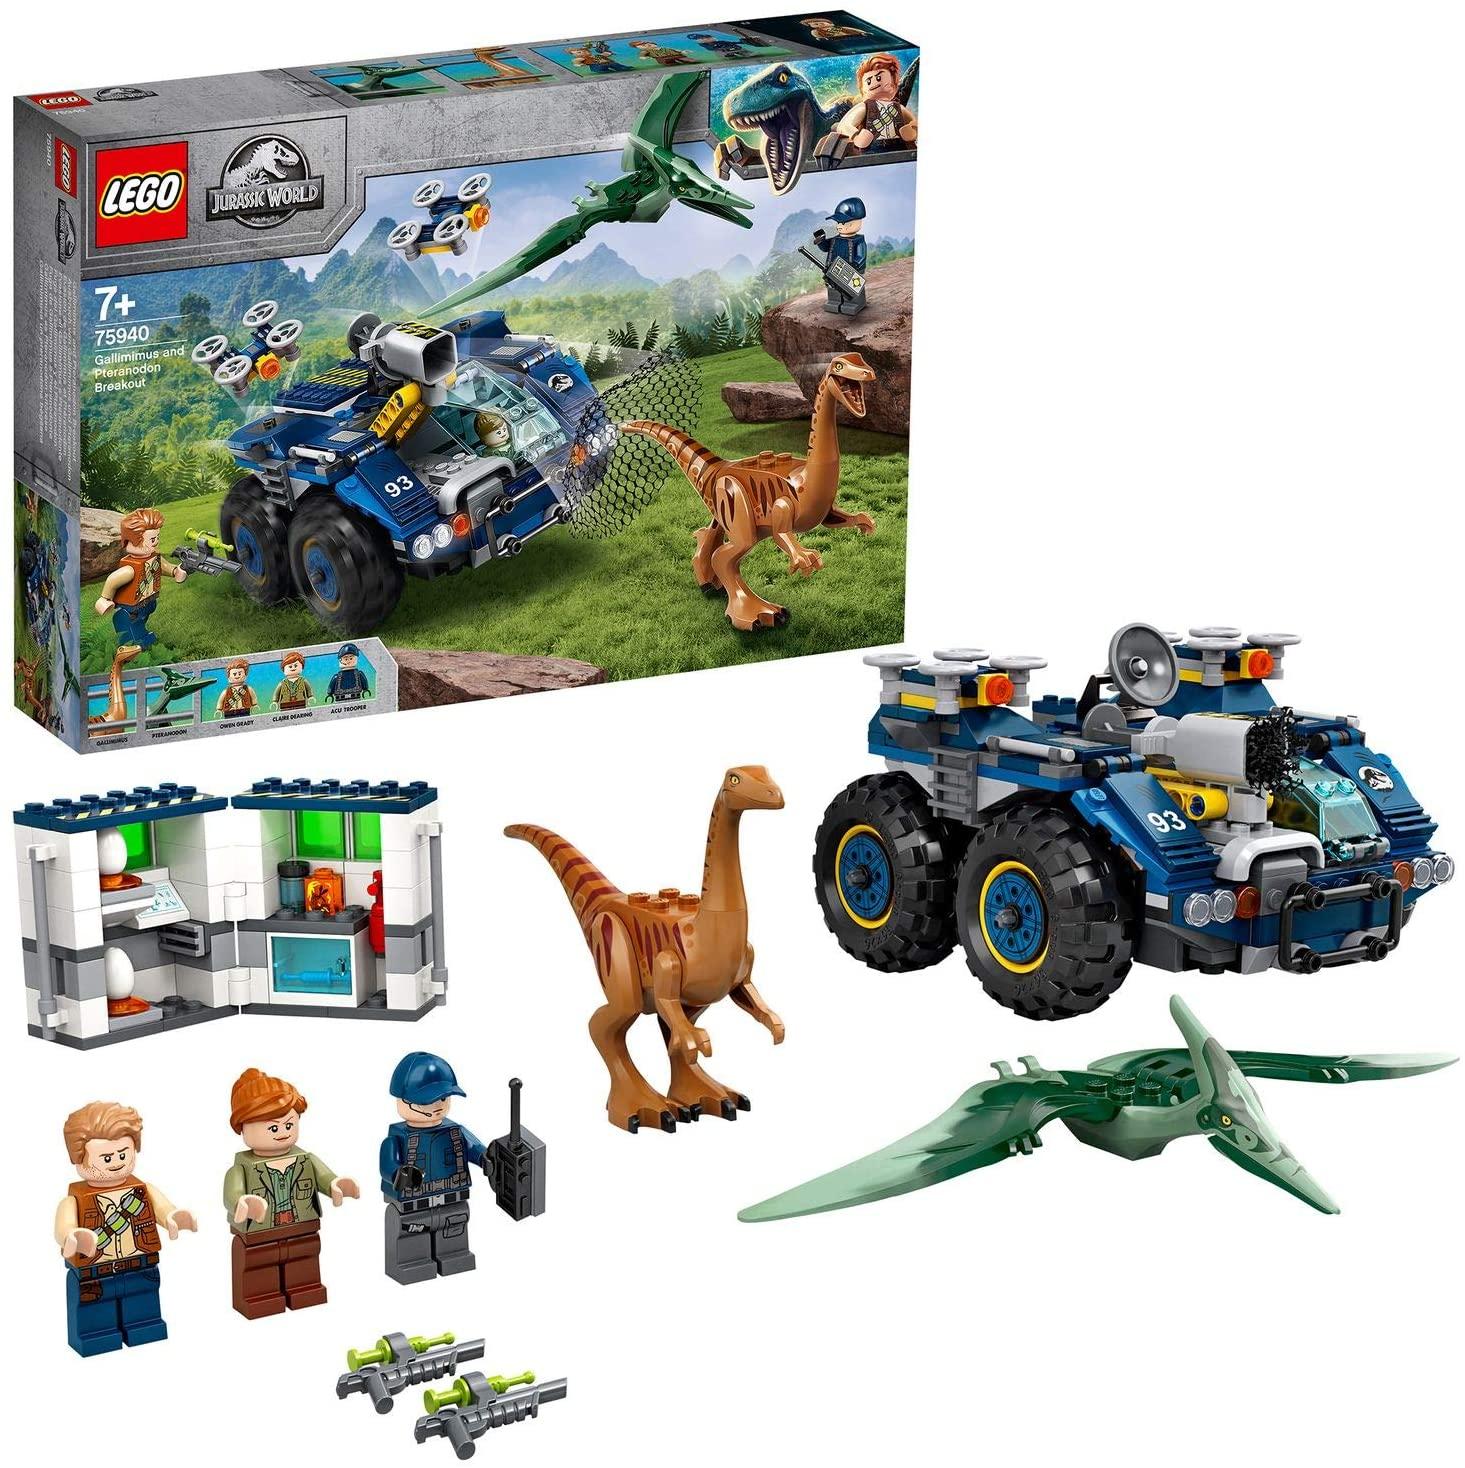 LEGO Jurassic World - Gallimimus and Pteranodon Breakout